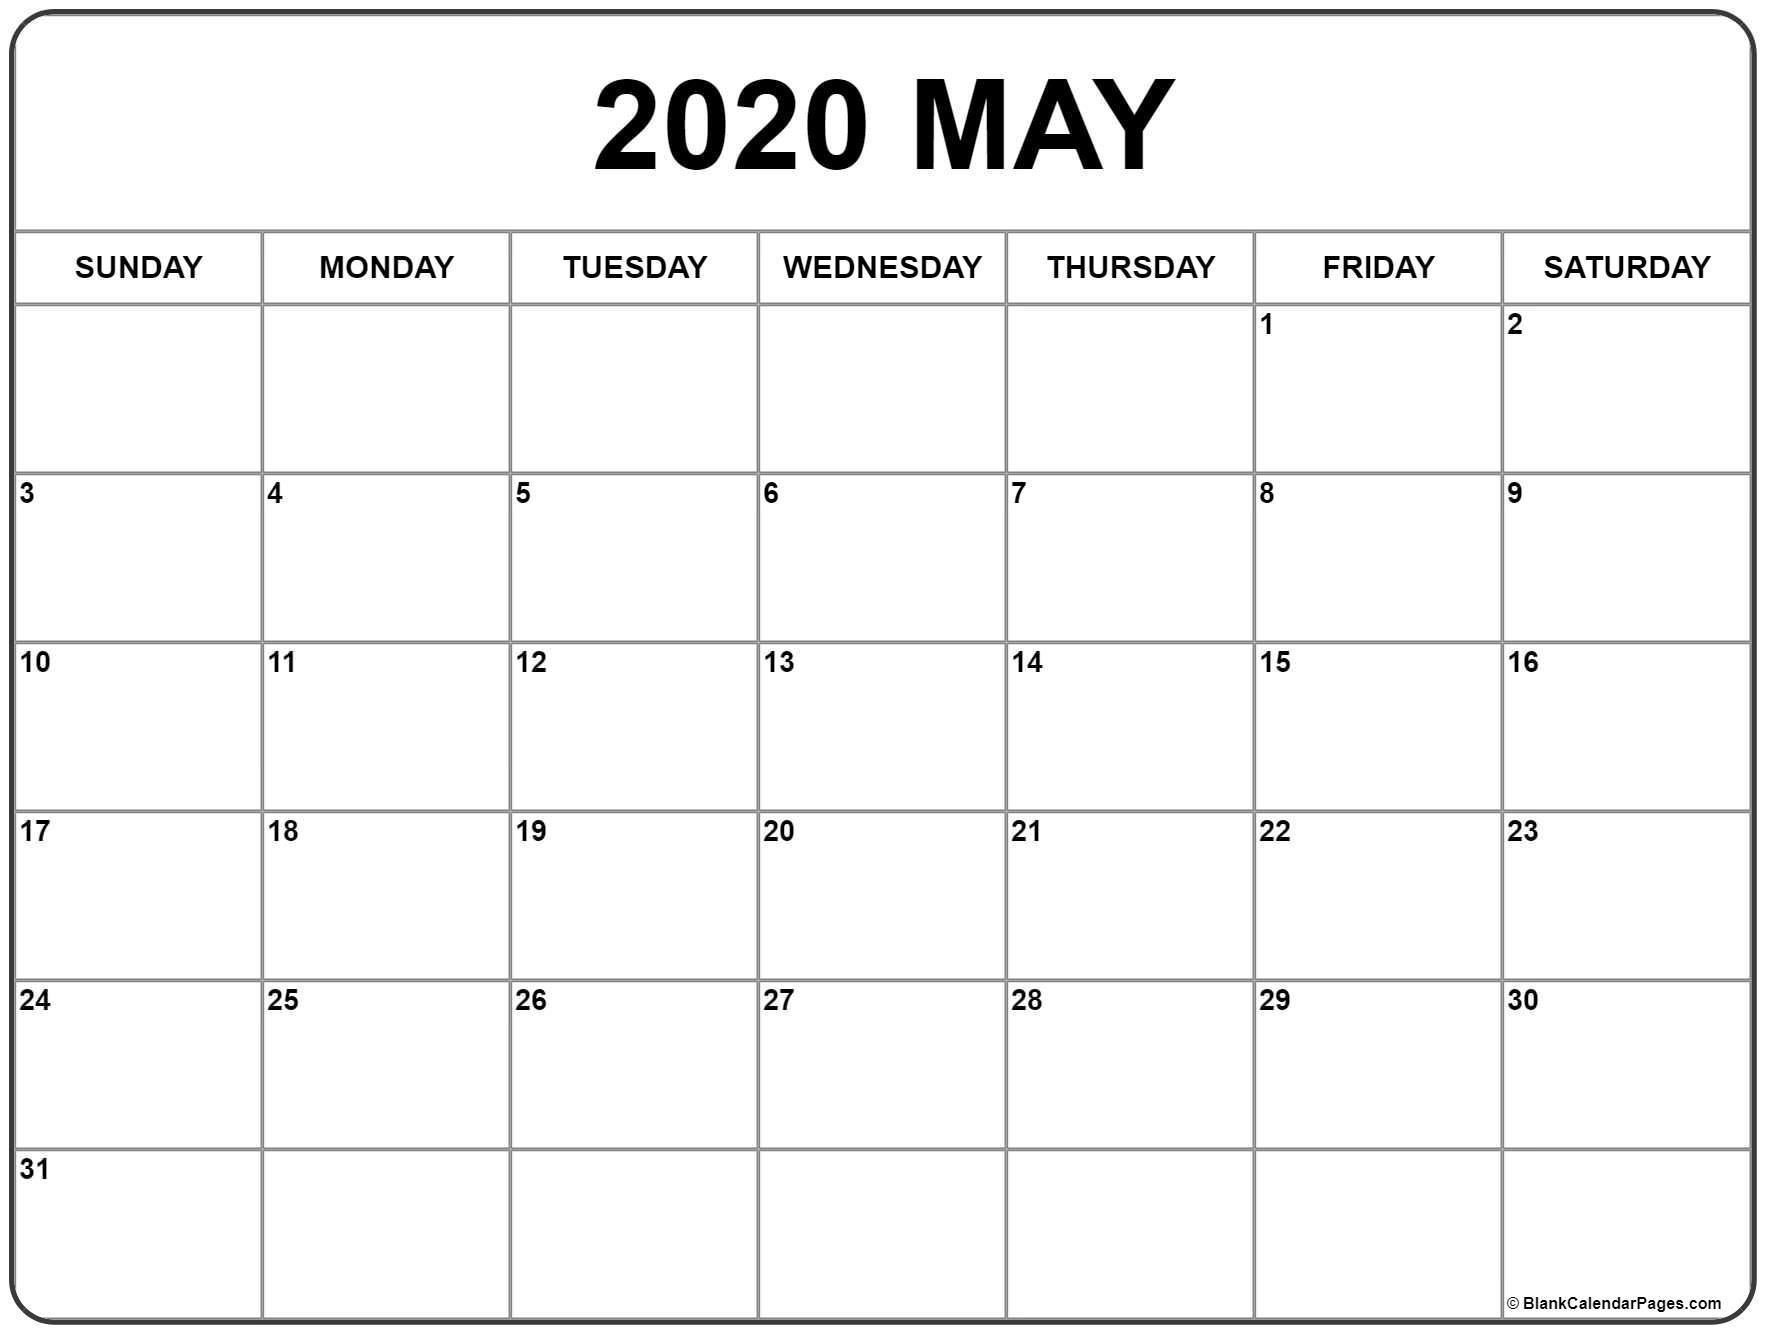 May 2020 Calendar | Free Printable Monthly Calendars-Blank 2